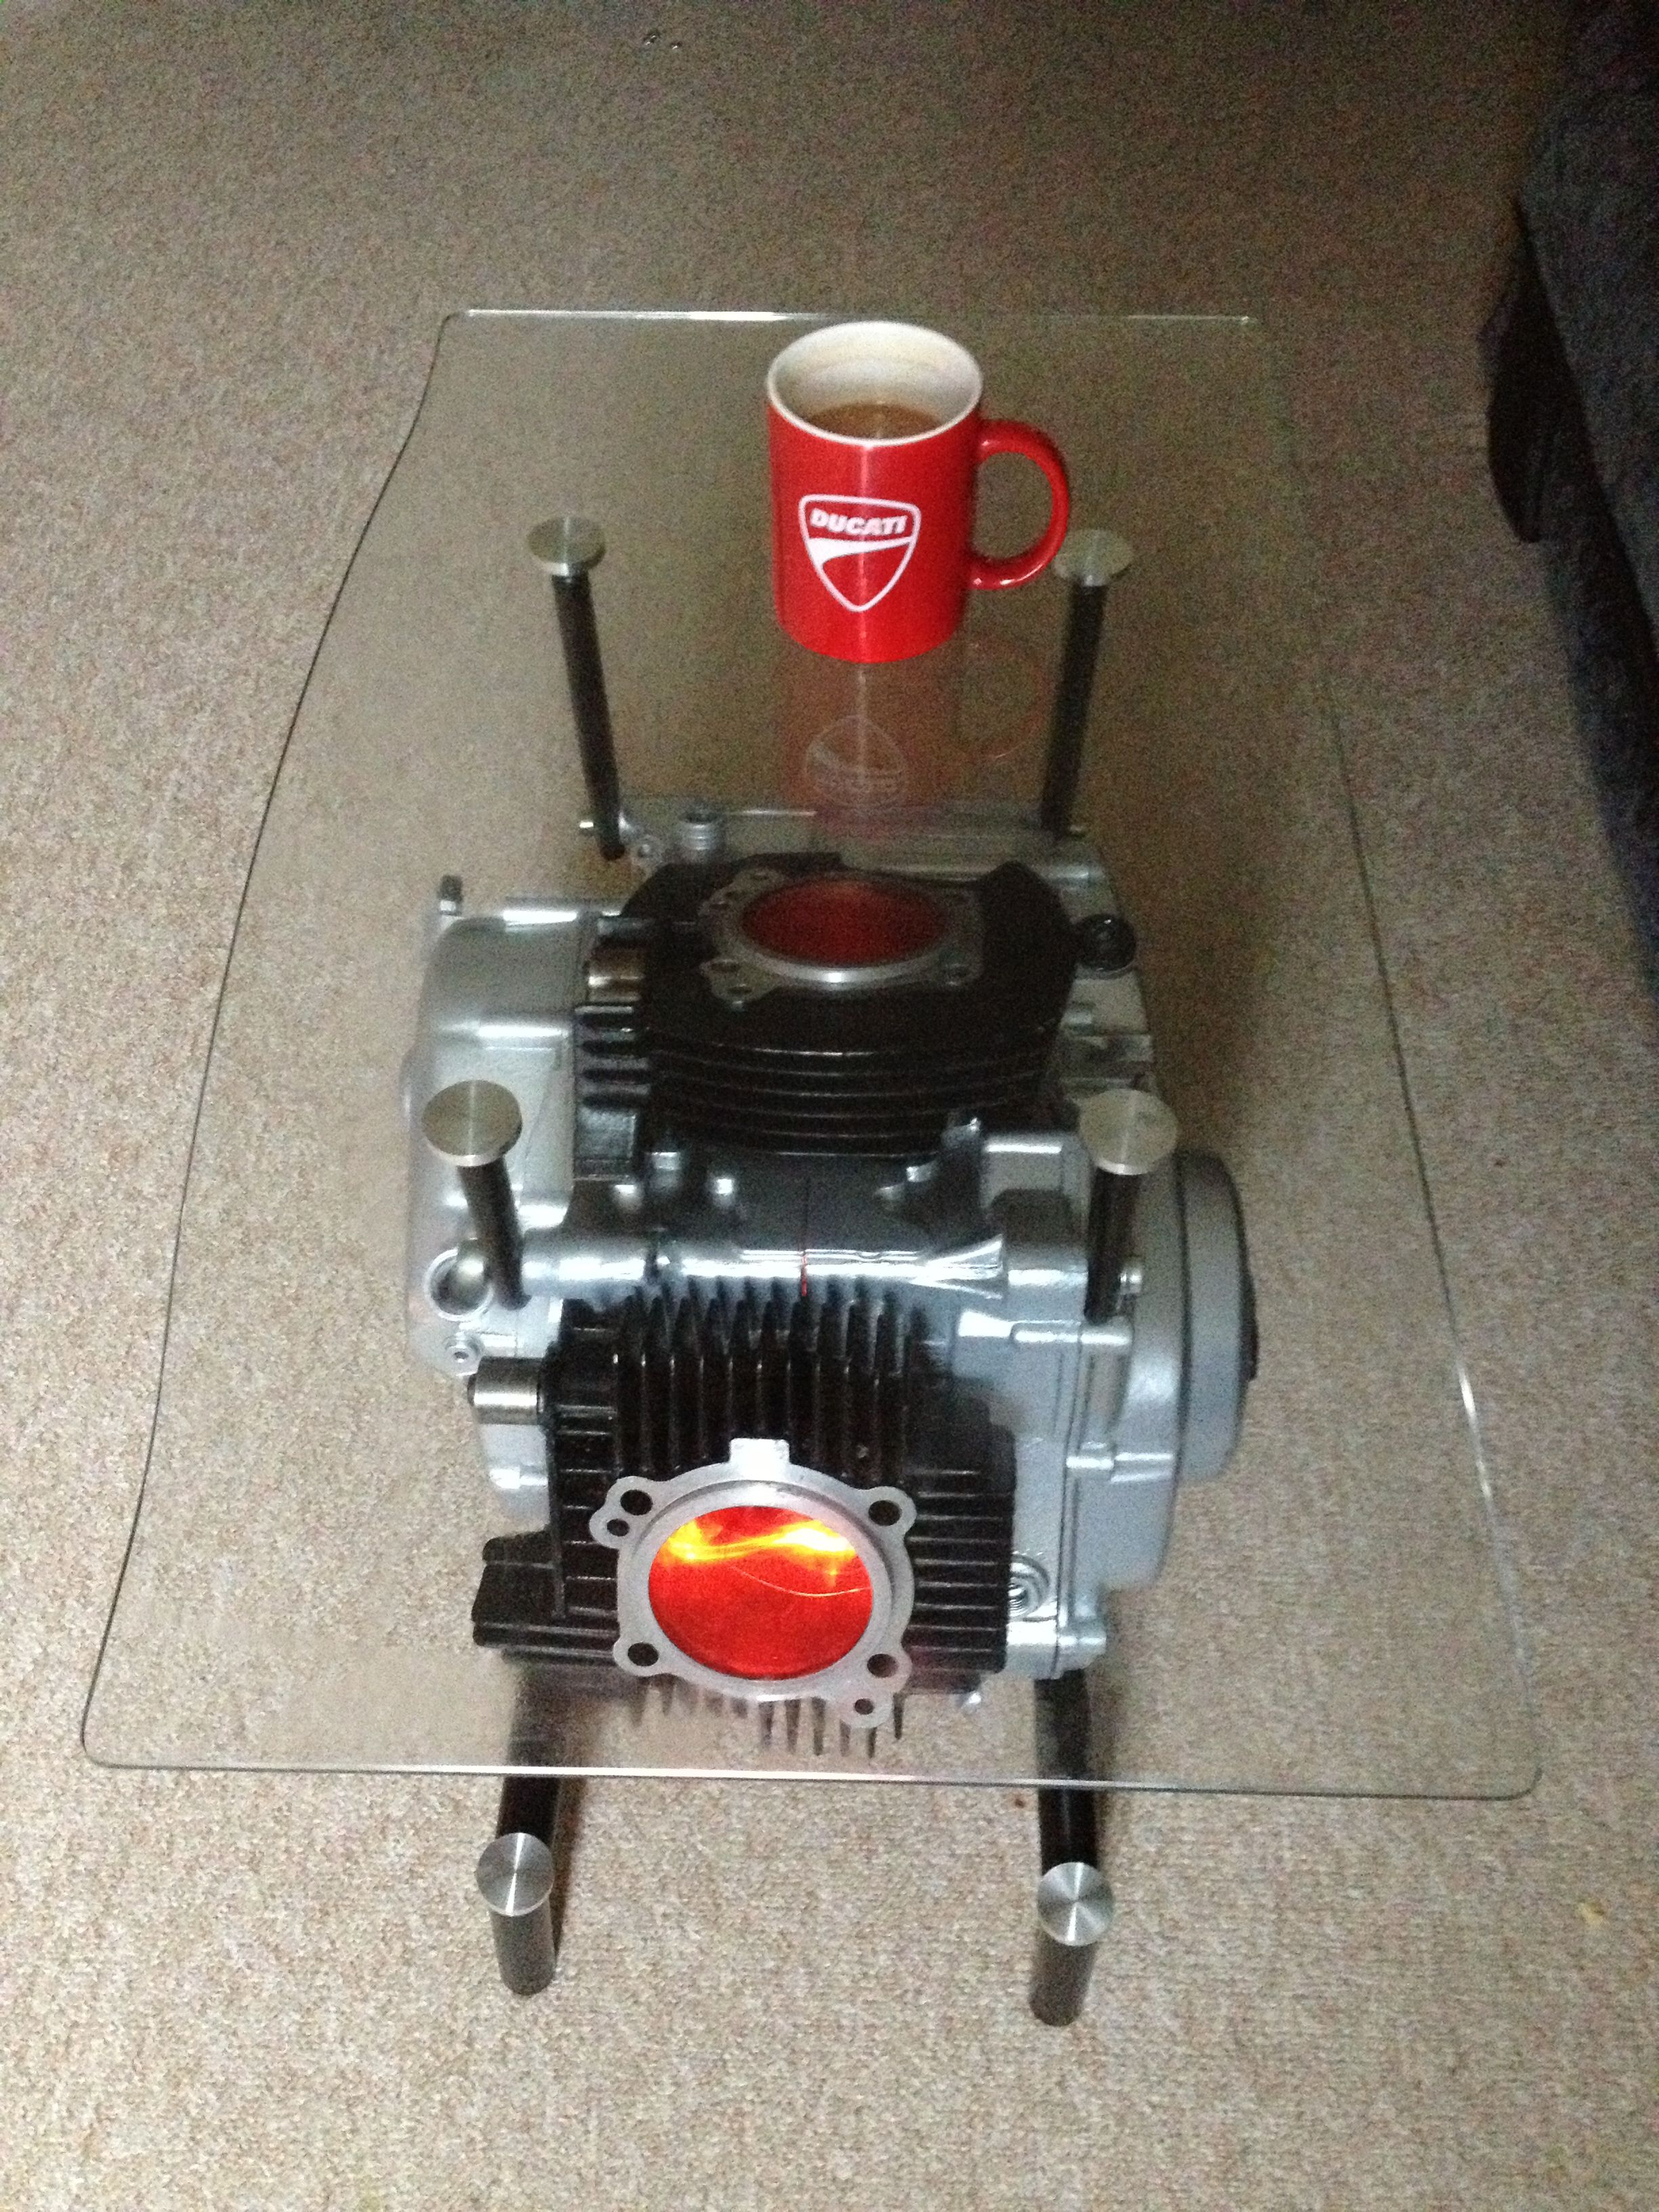 Ducati V Twin Engine Coffee Table Odd Things Pinterest Engine - Motor coffee table